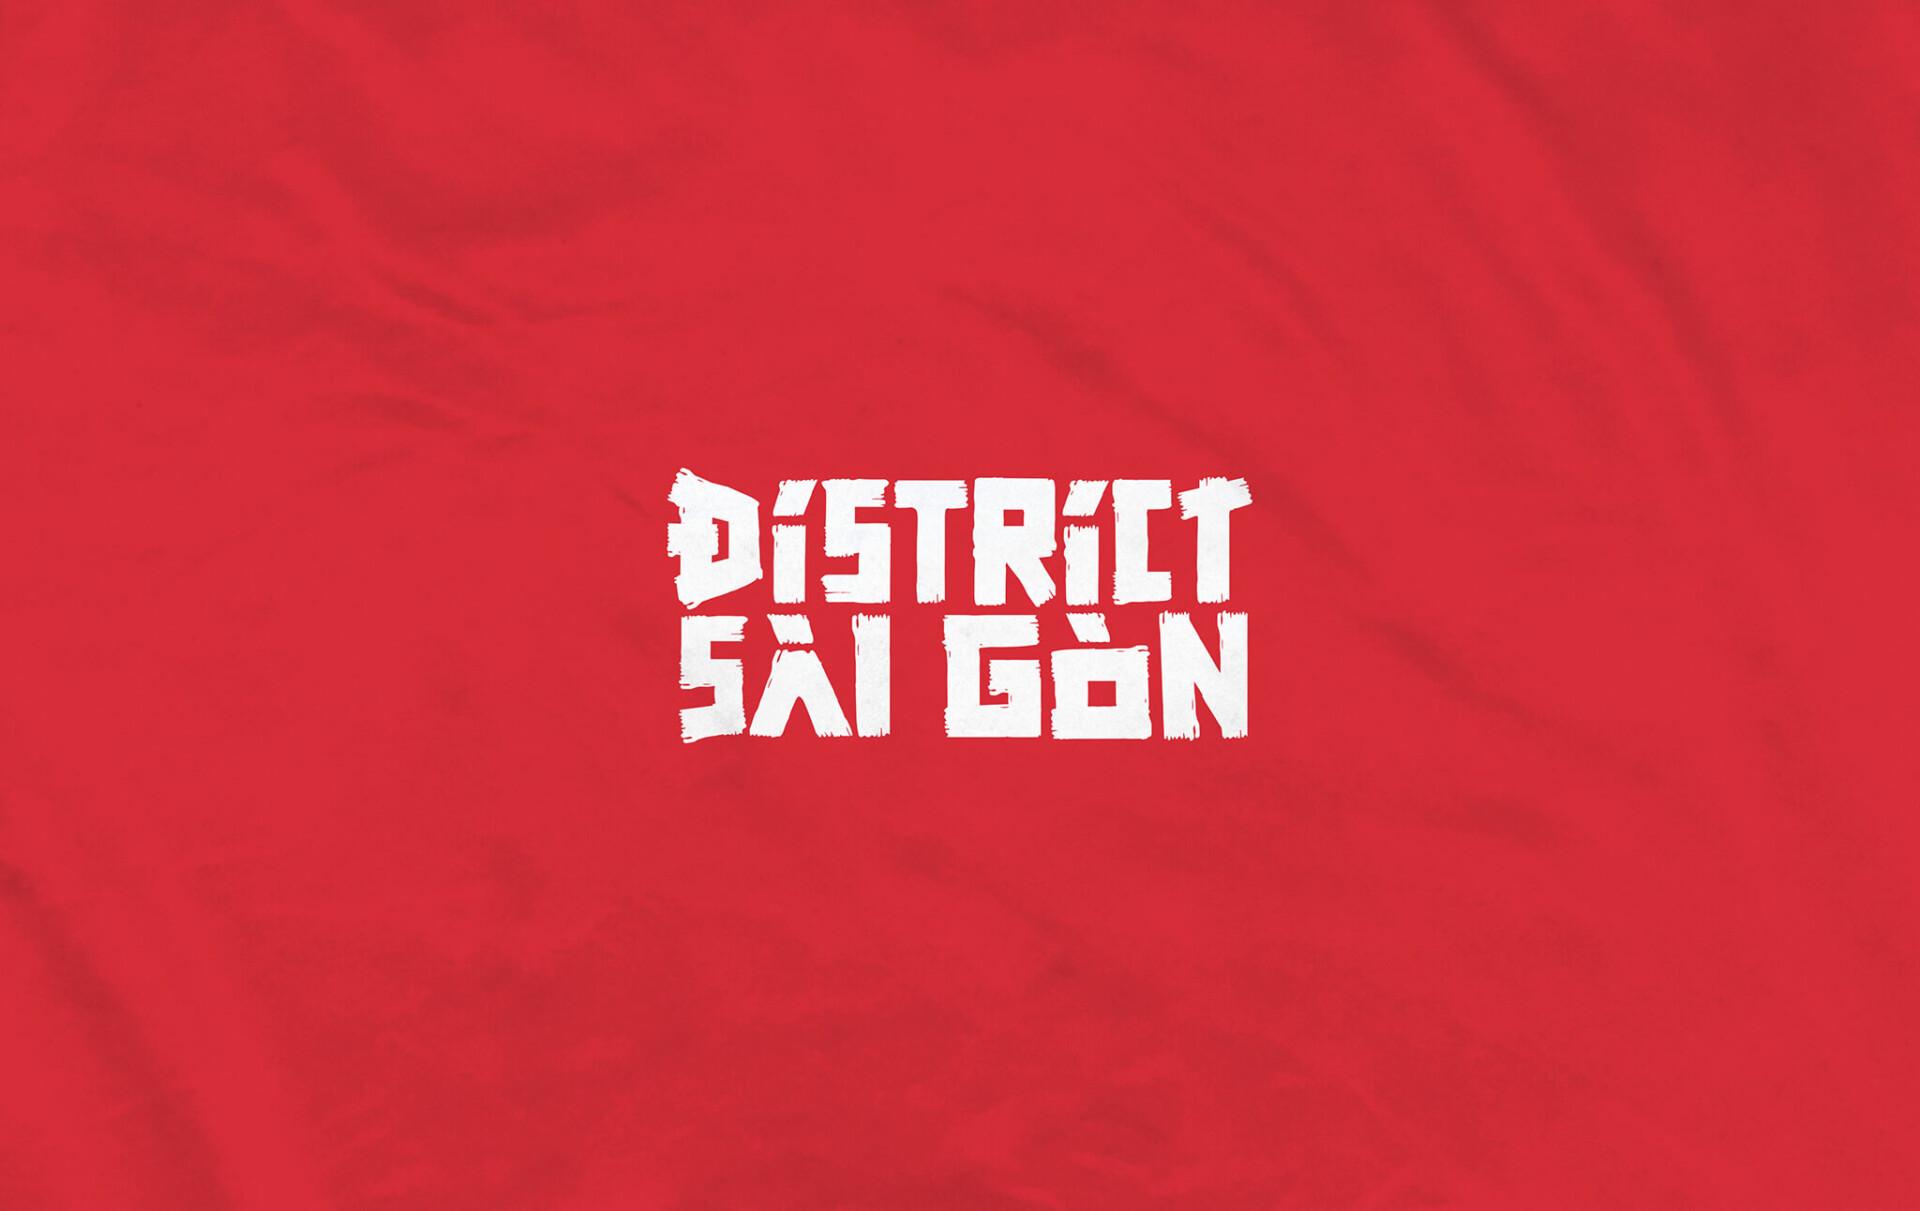 Brian Storm - Illustration & Design Logo Design